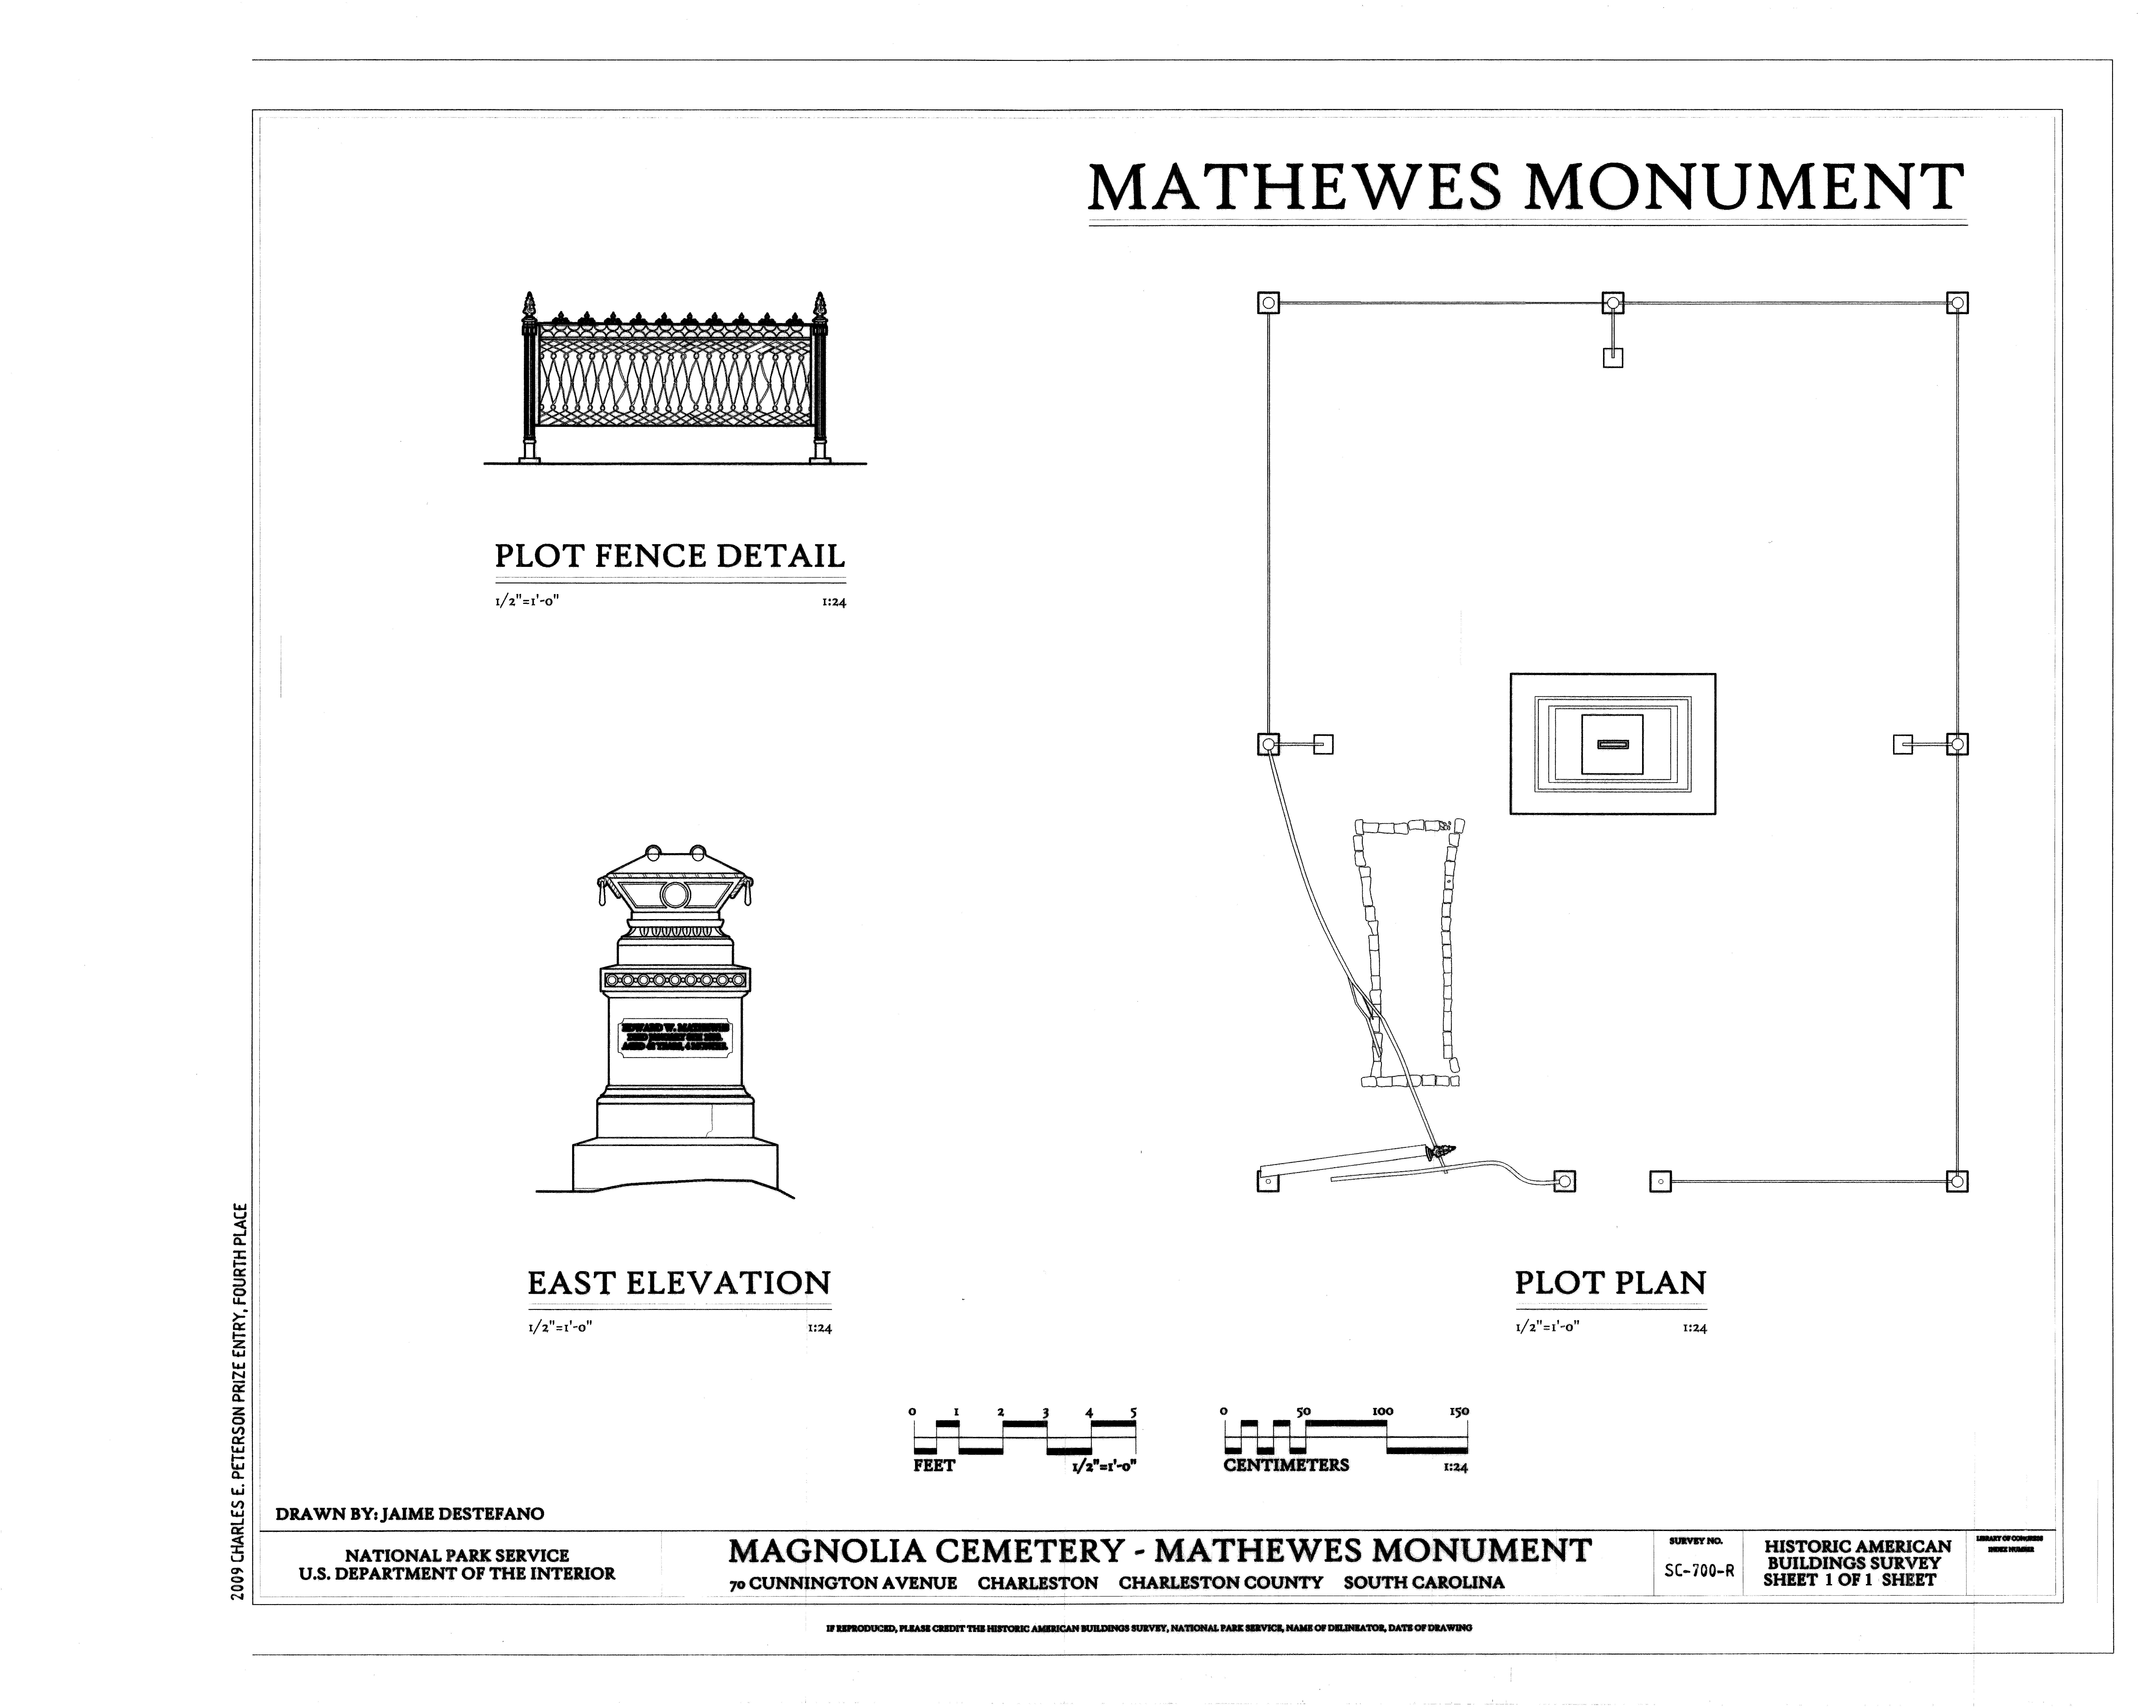 File elevation plot plan and plot fence detail magnolia for Find plot plan online